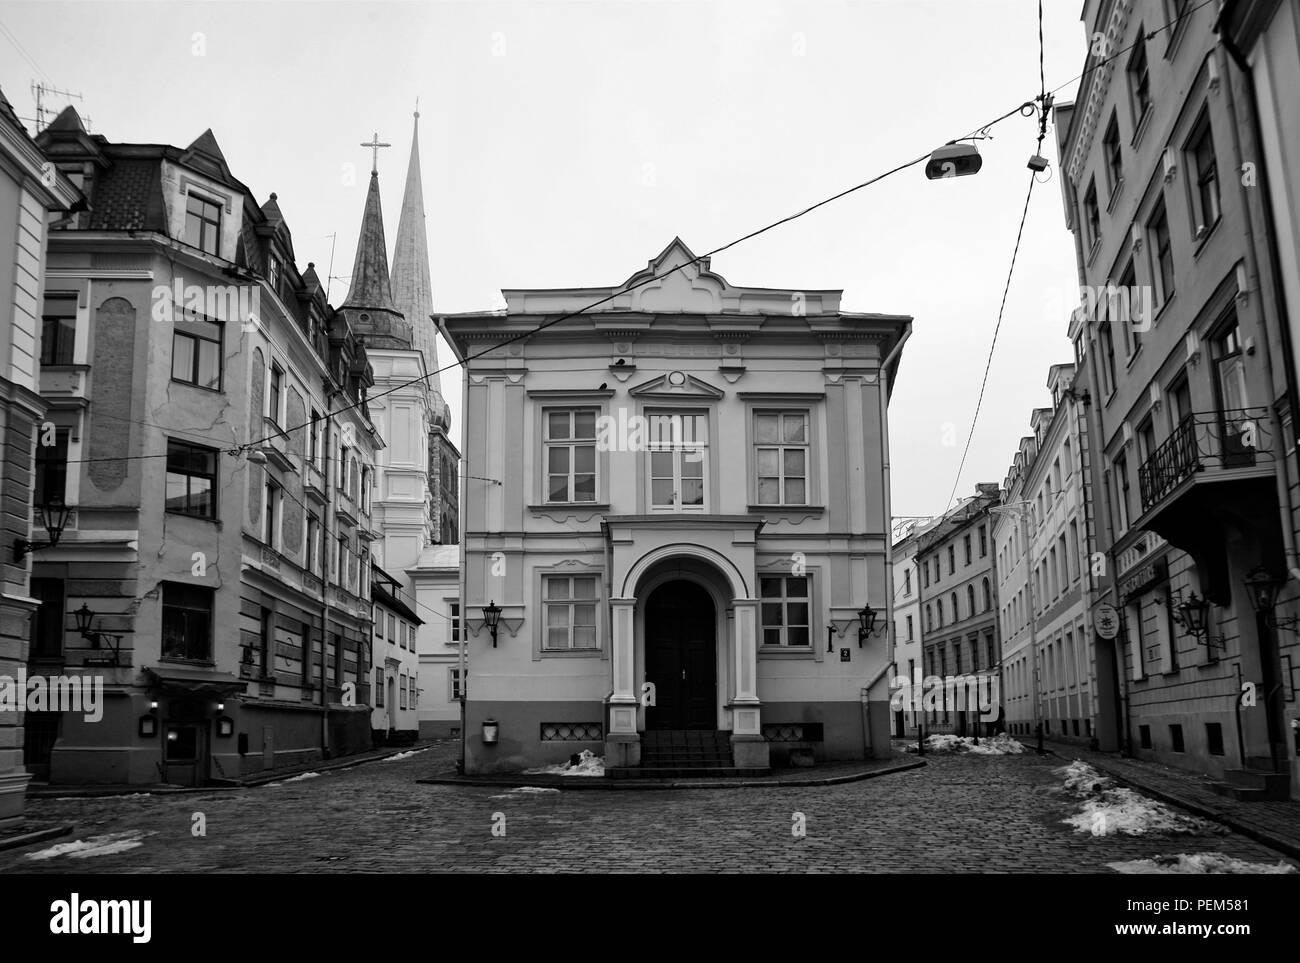 Streets of Riga - Stock Image